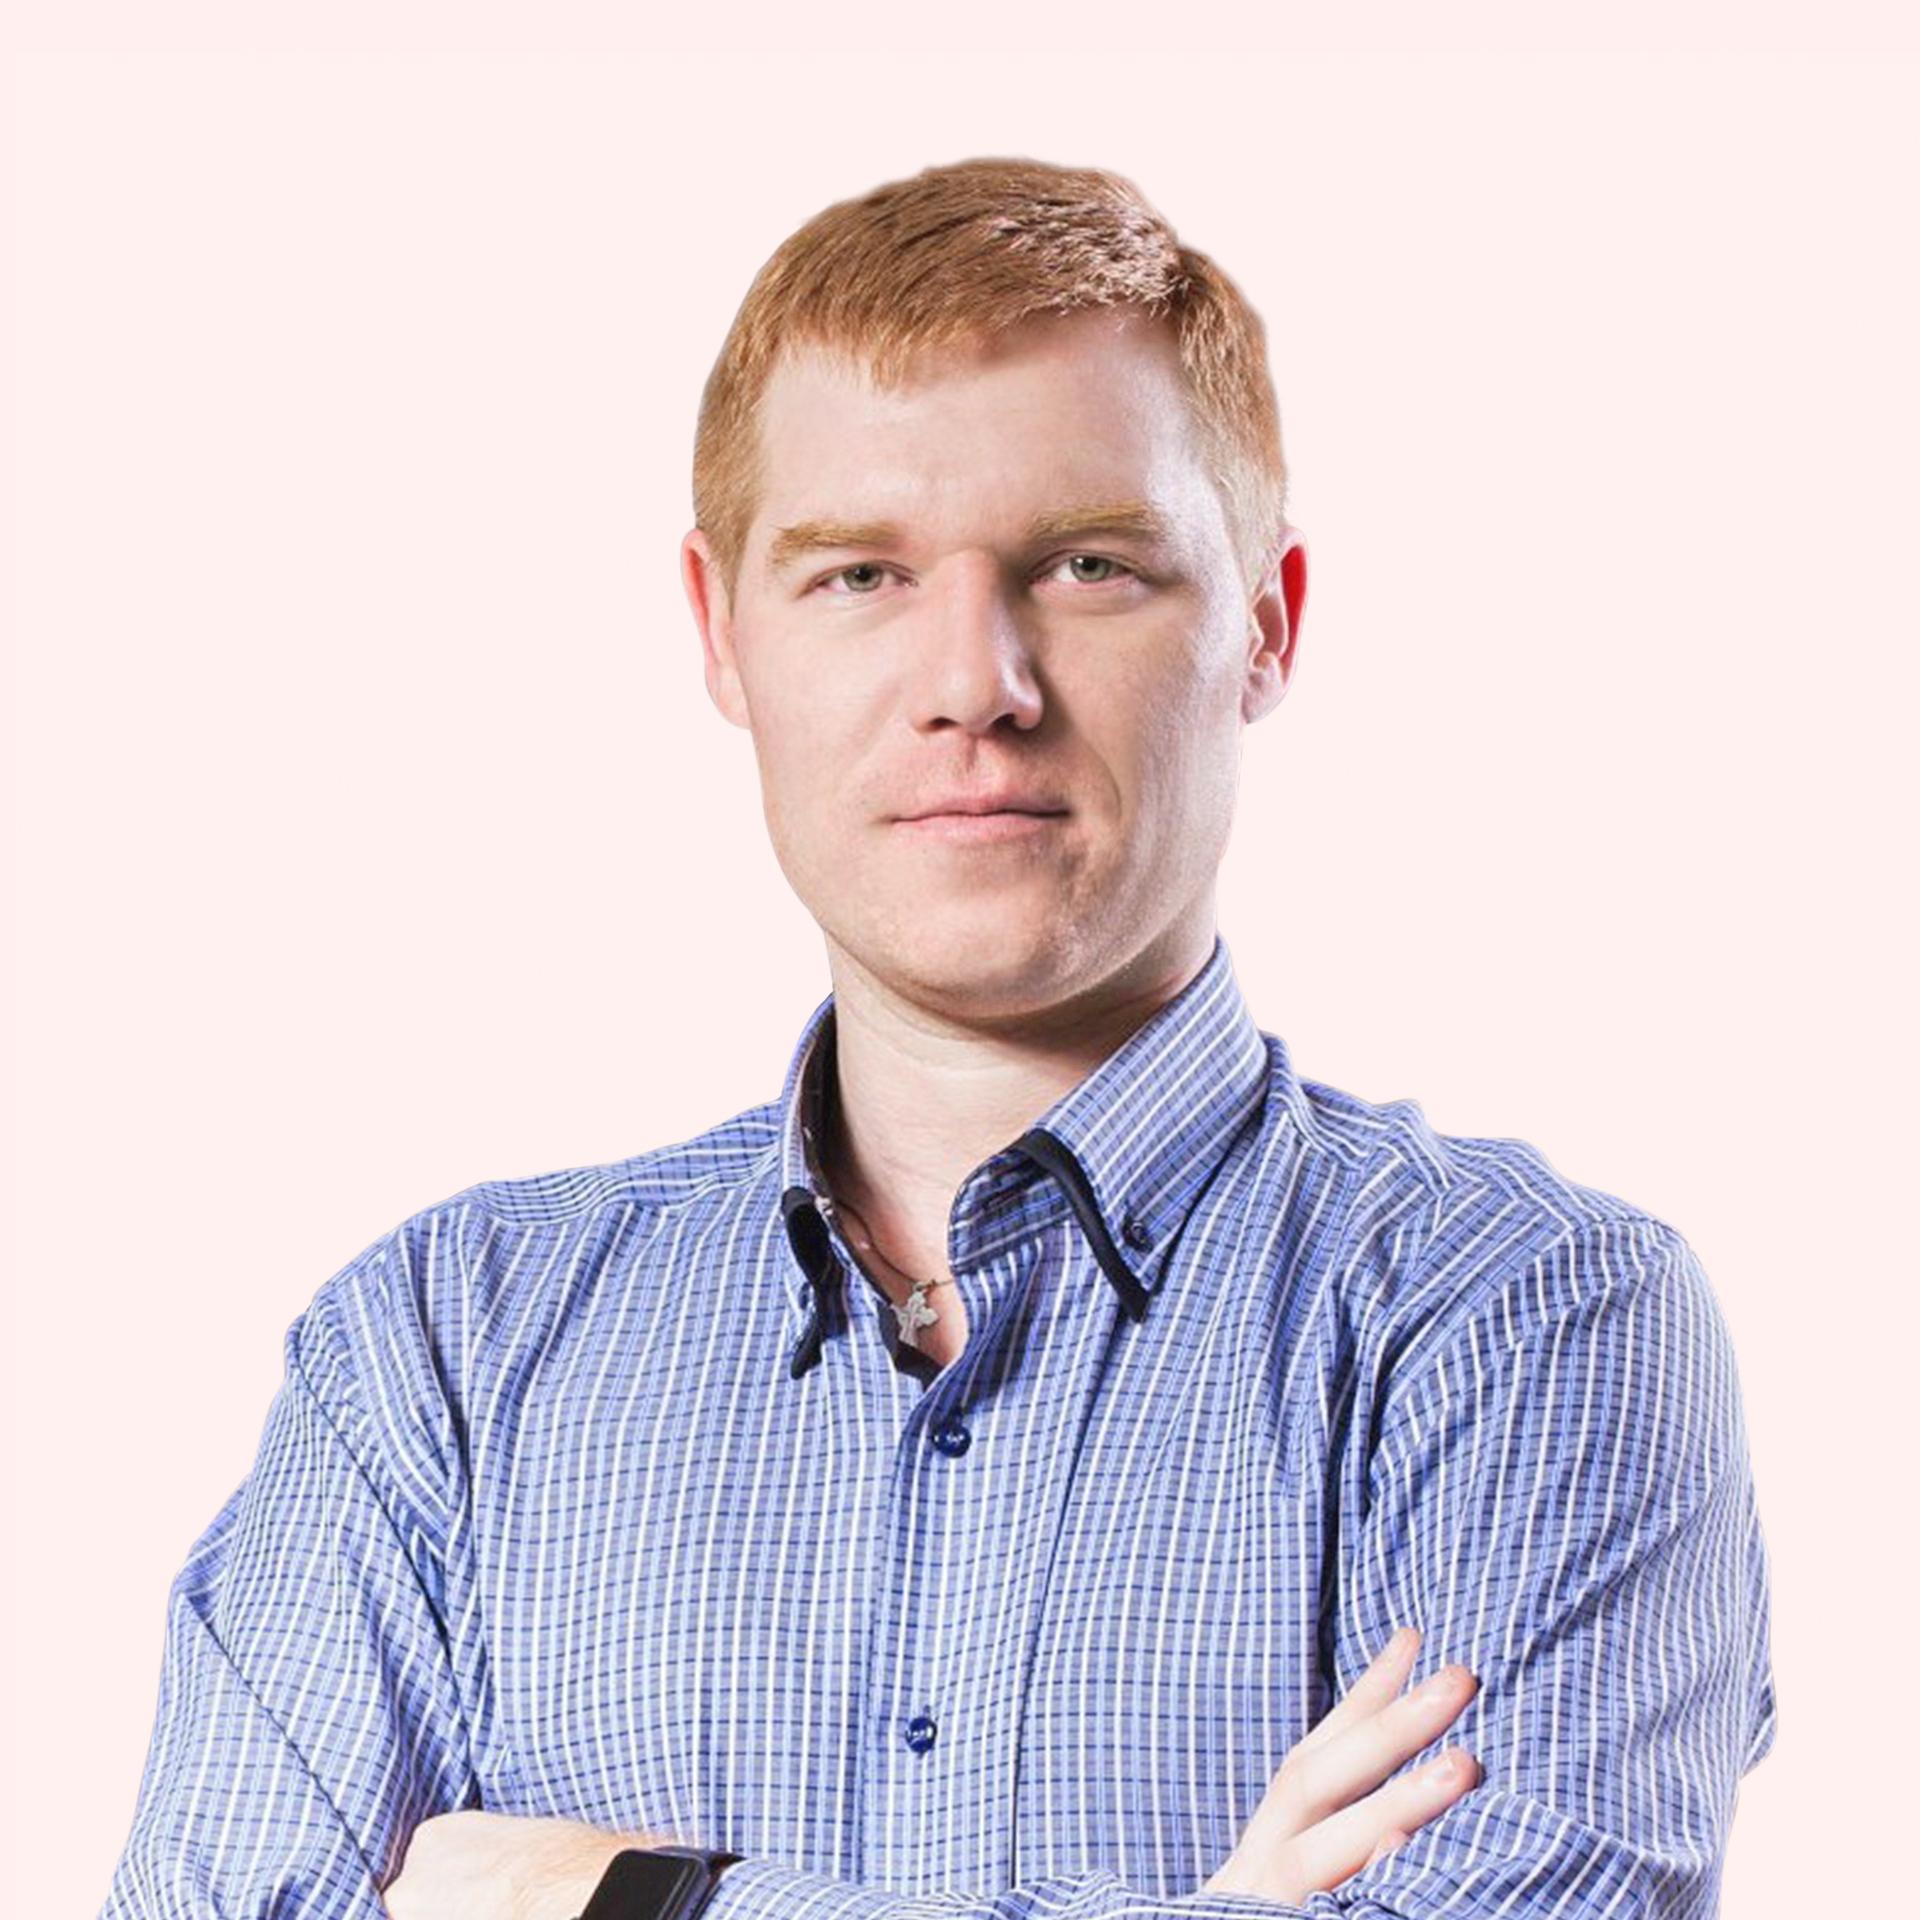 Oleksandr Vasilyev